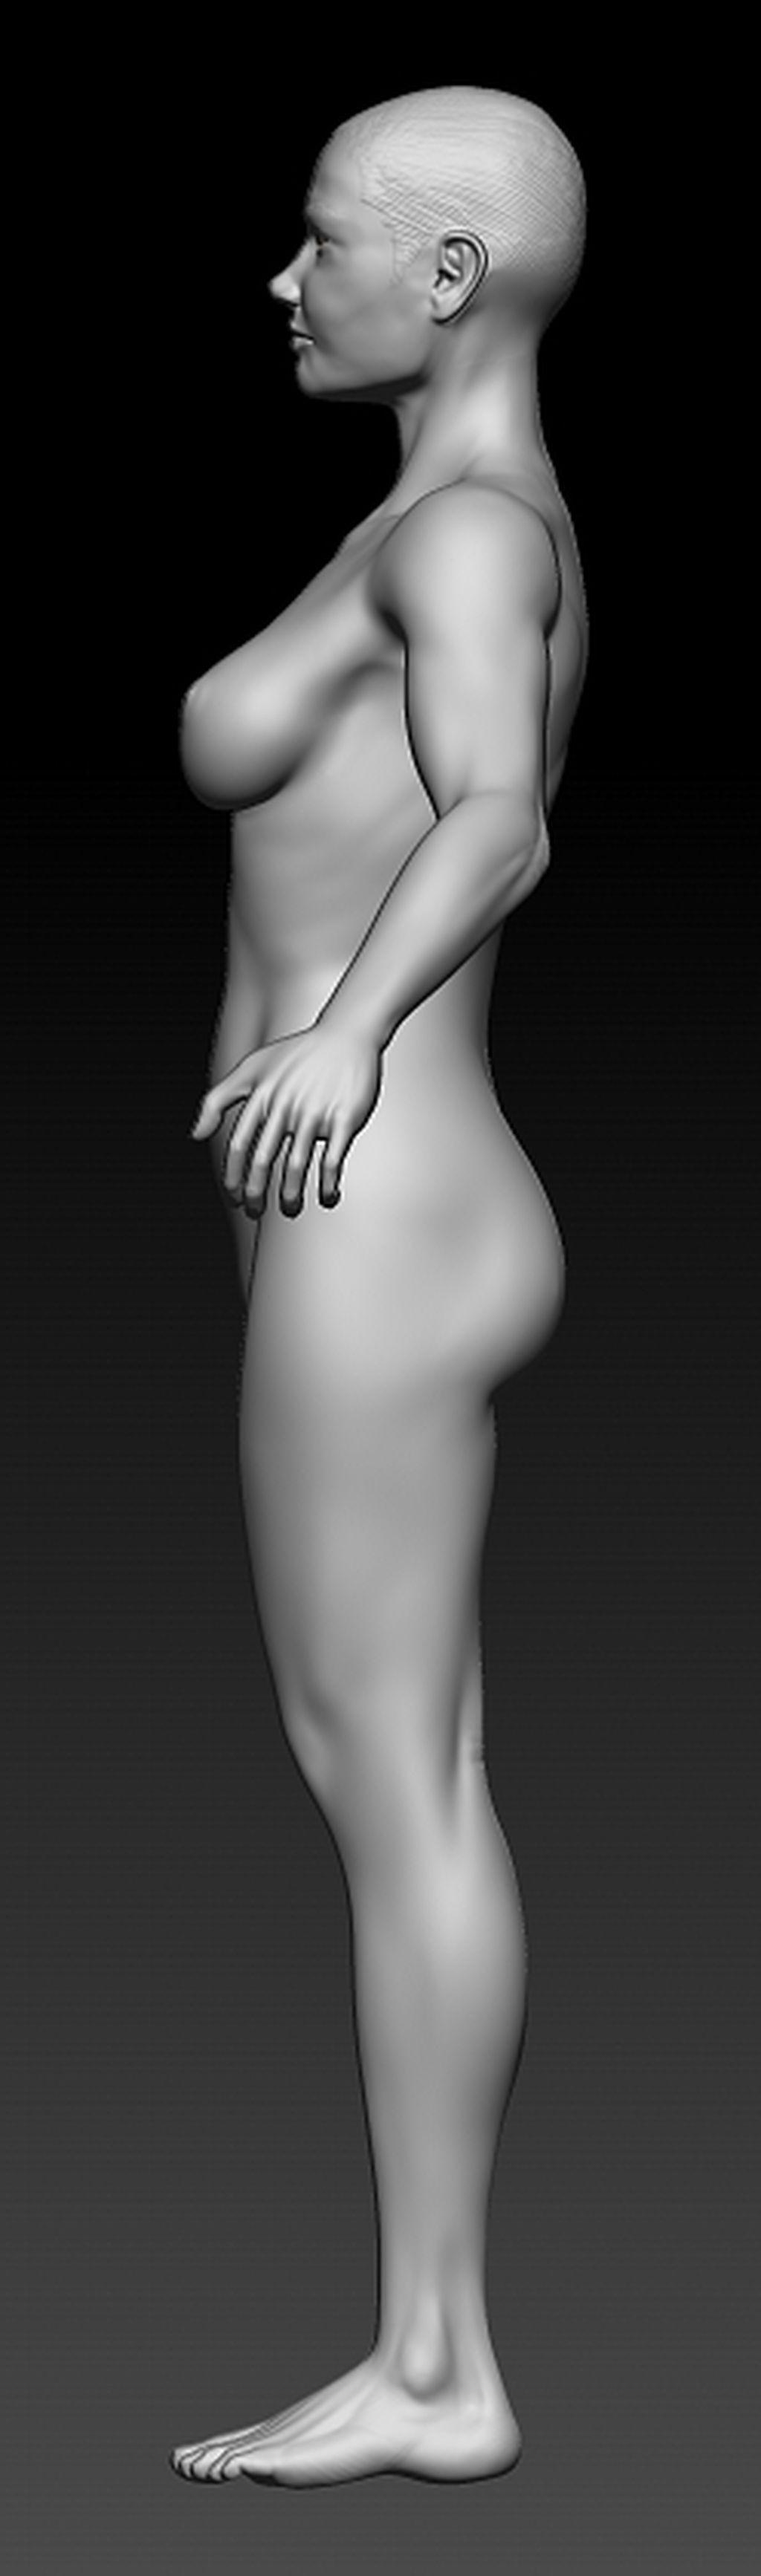 female side.jpg